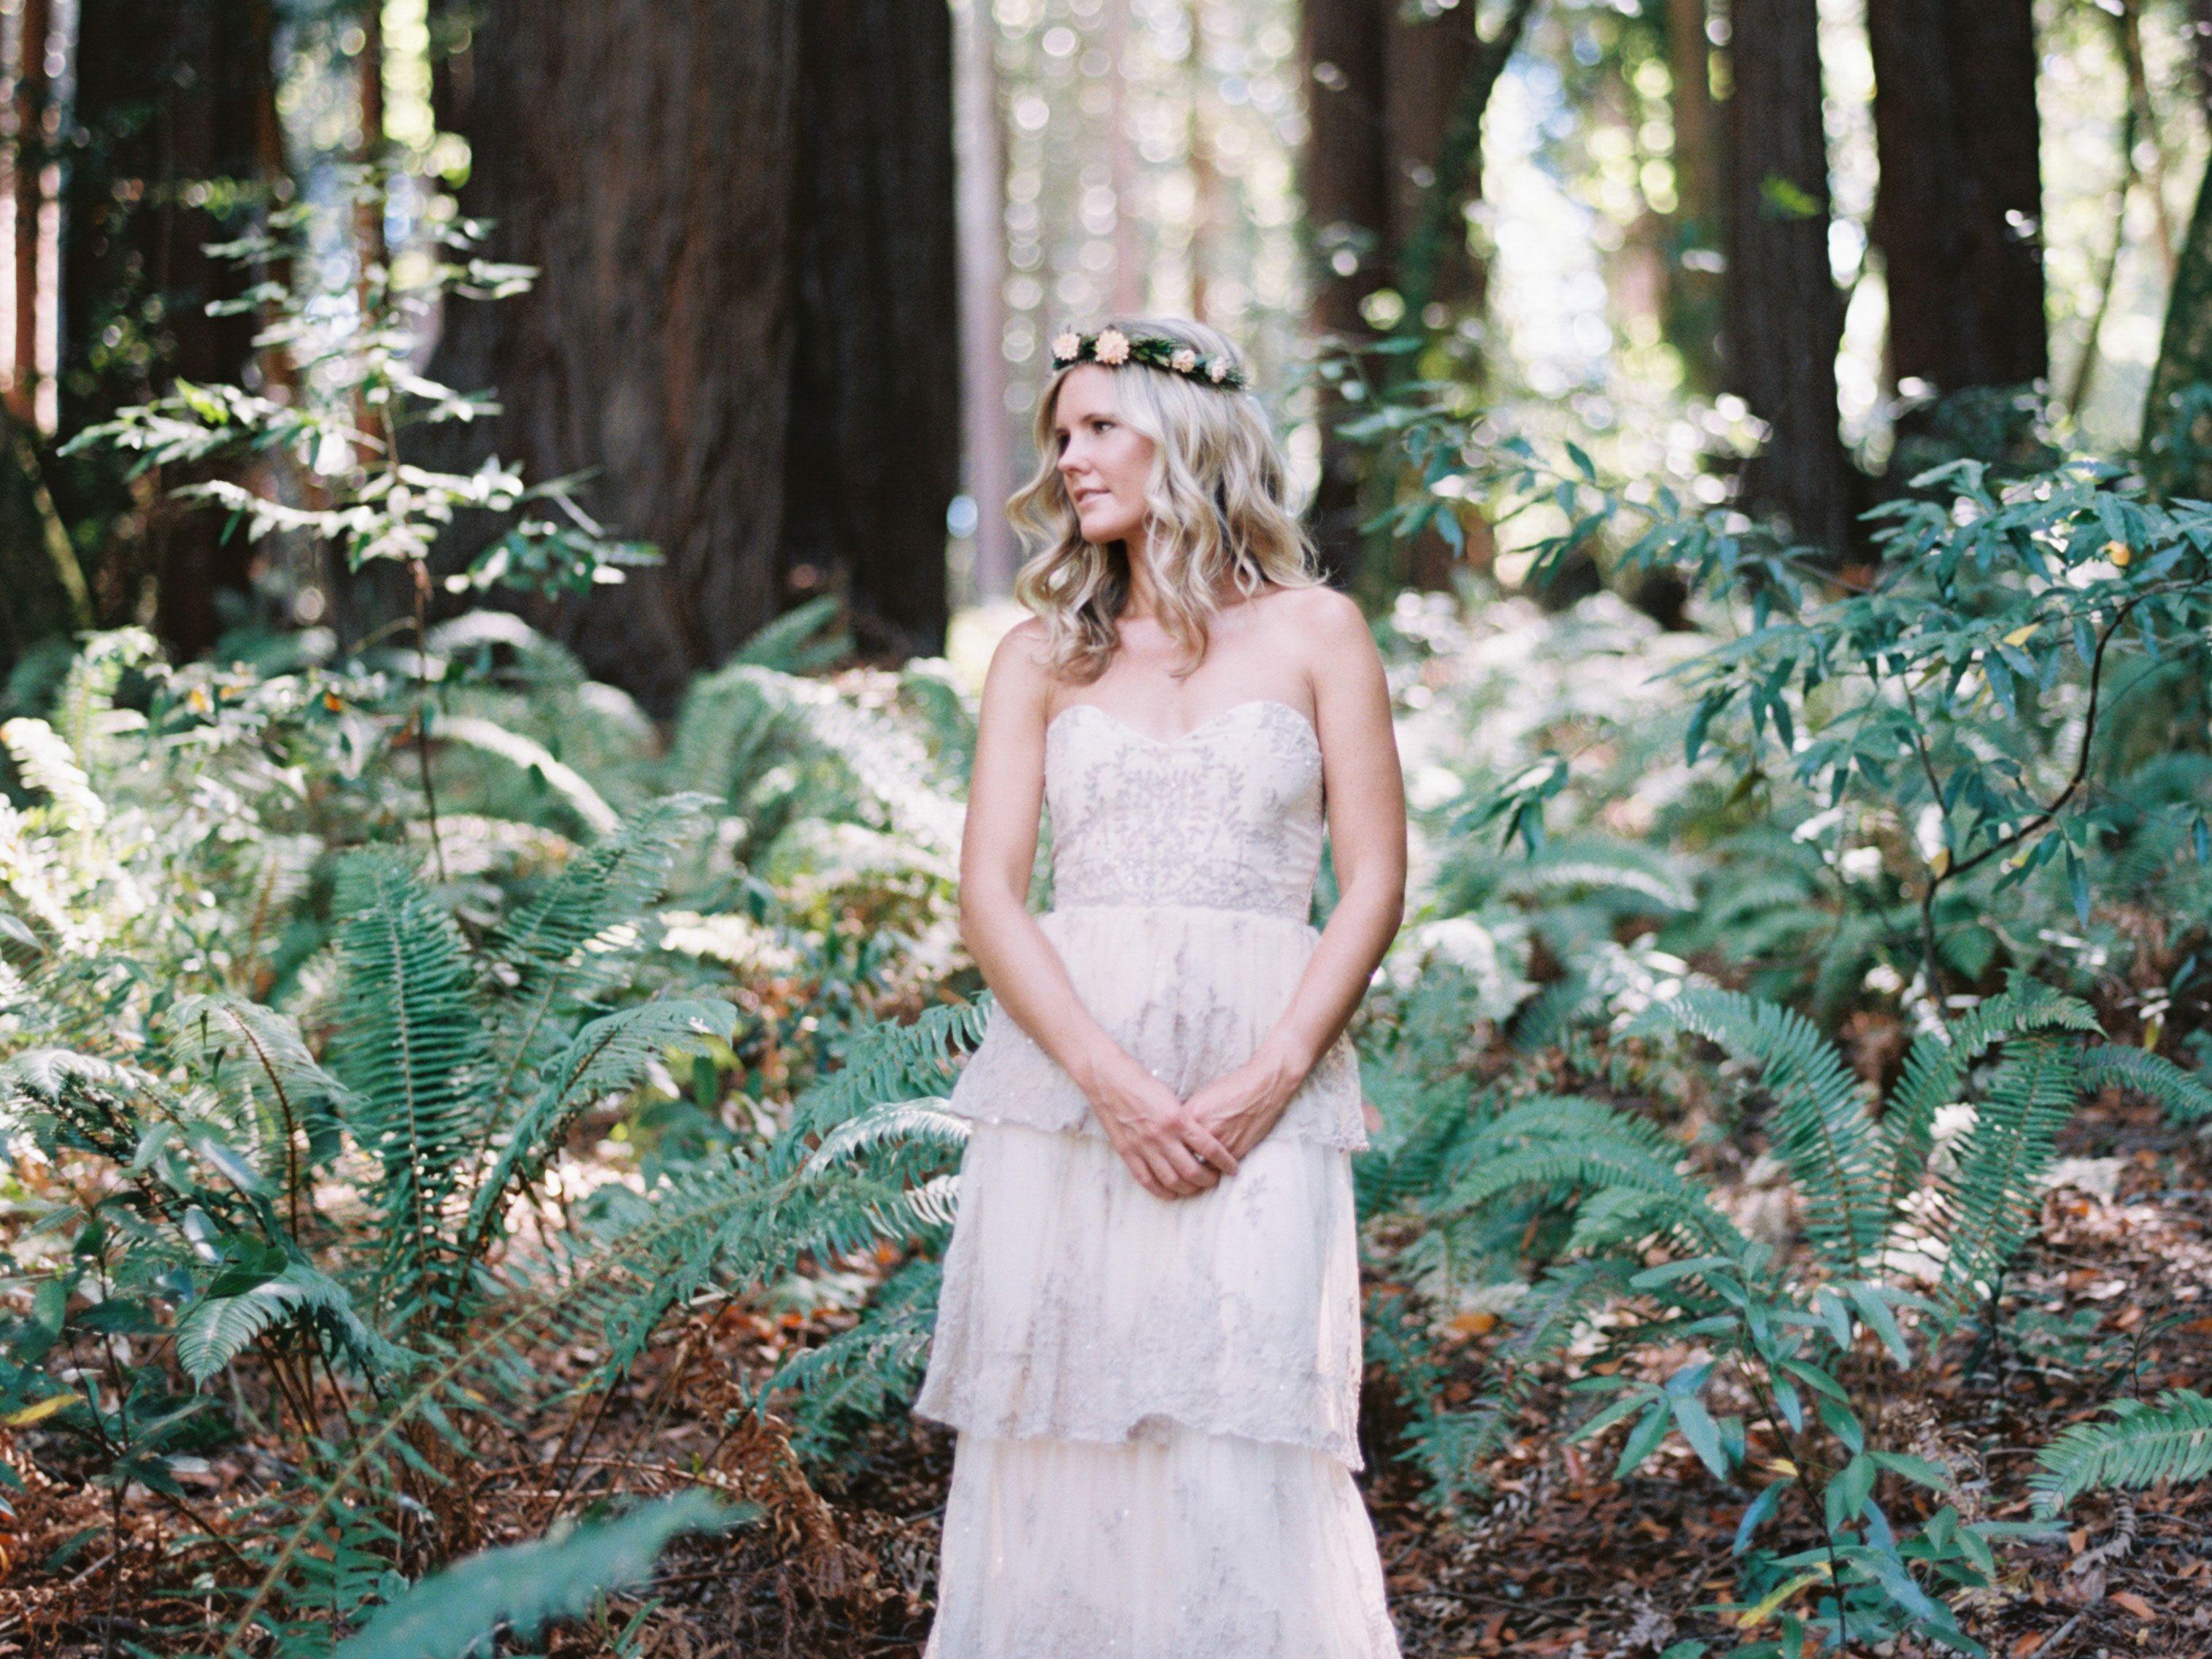 Bridechilla Style: Shop This Laid Back Bridal Trend